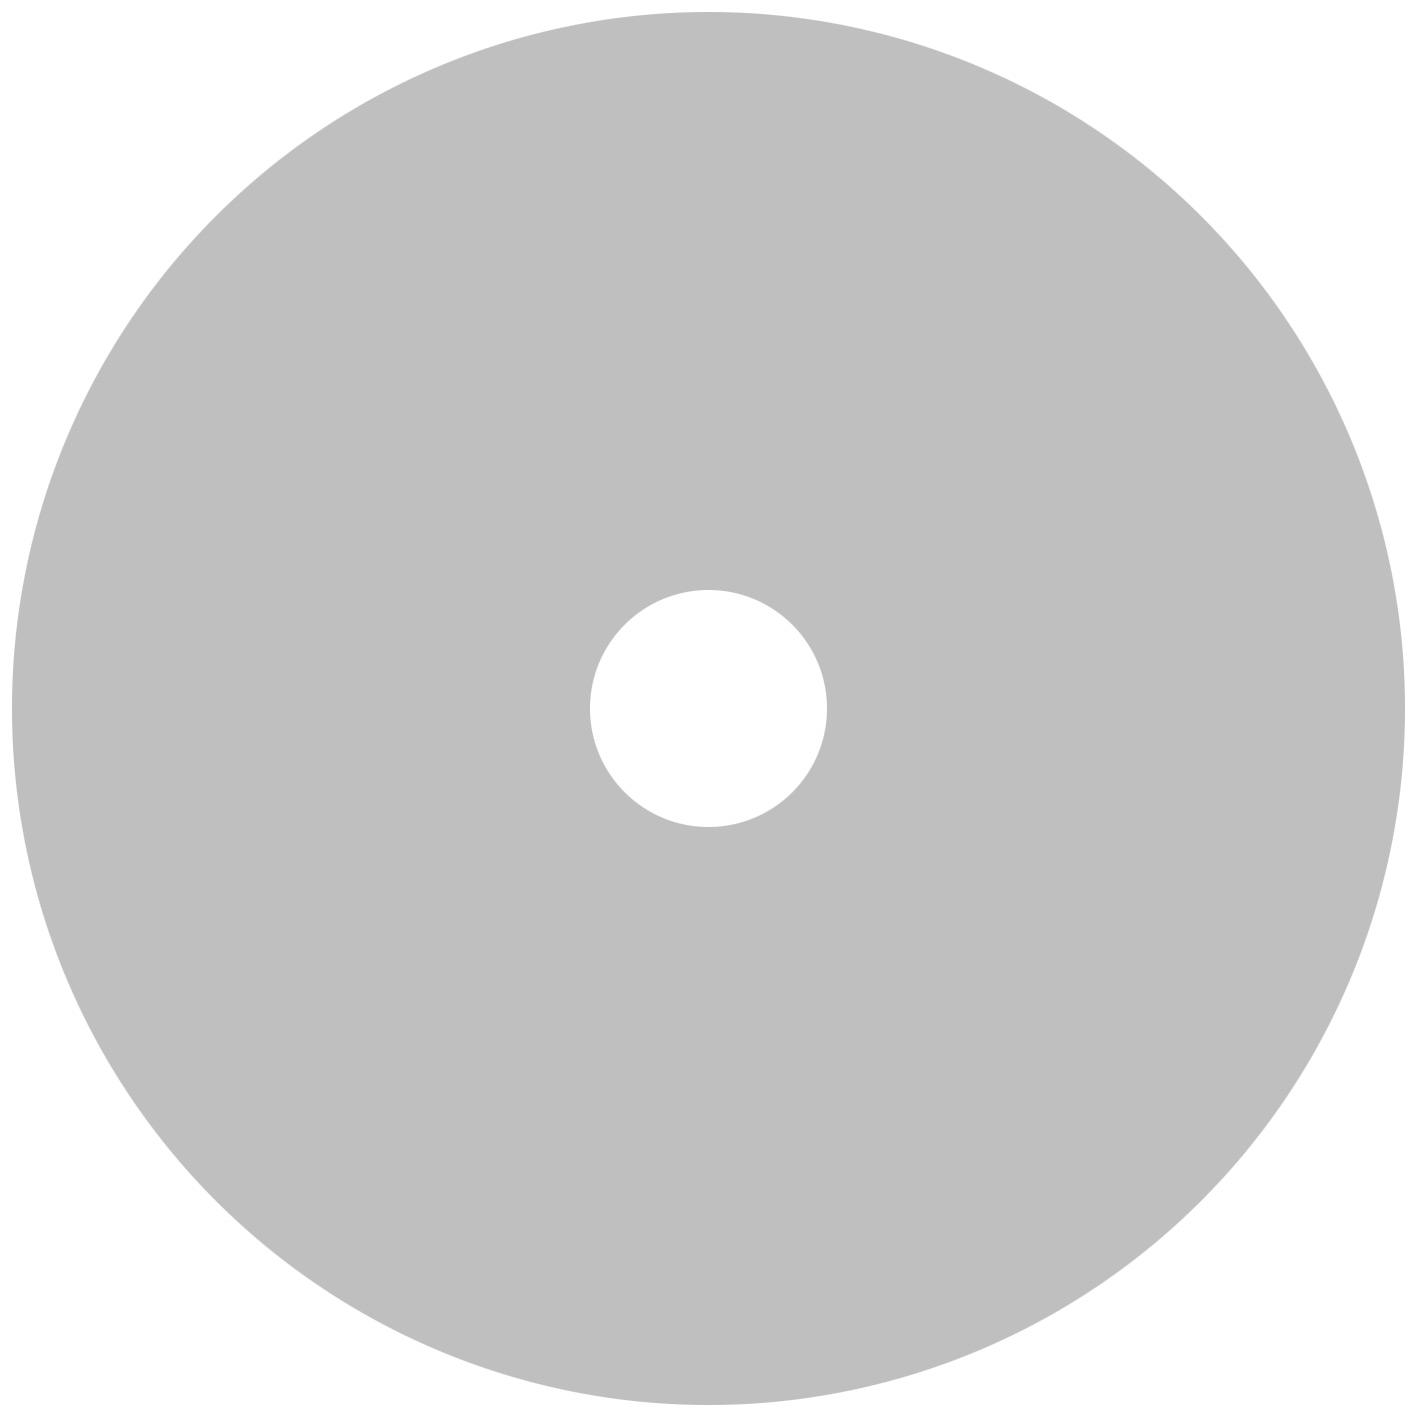 cd label template psd